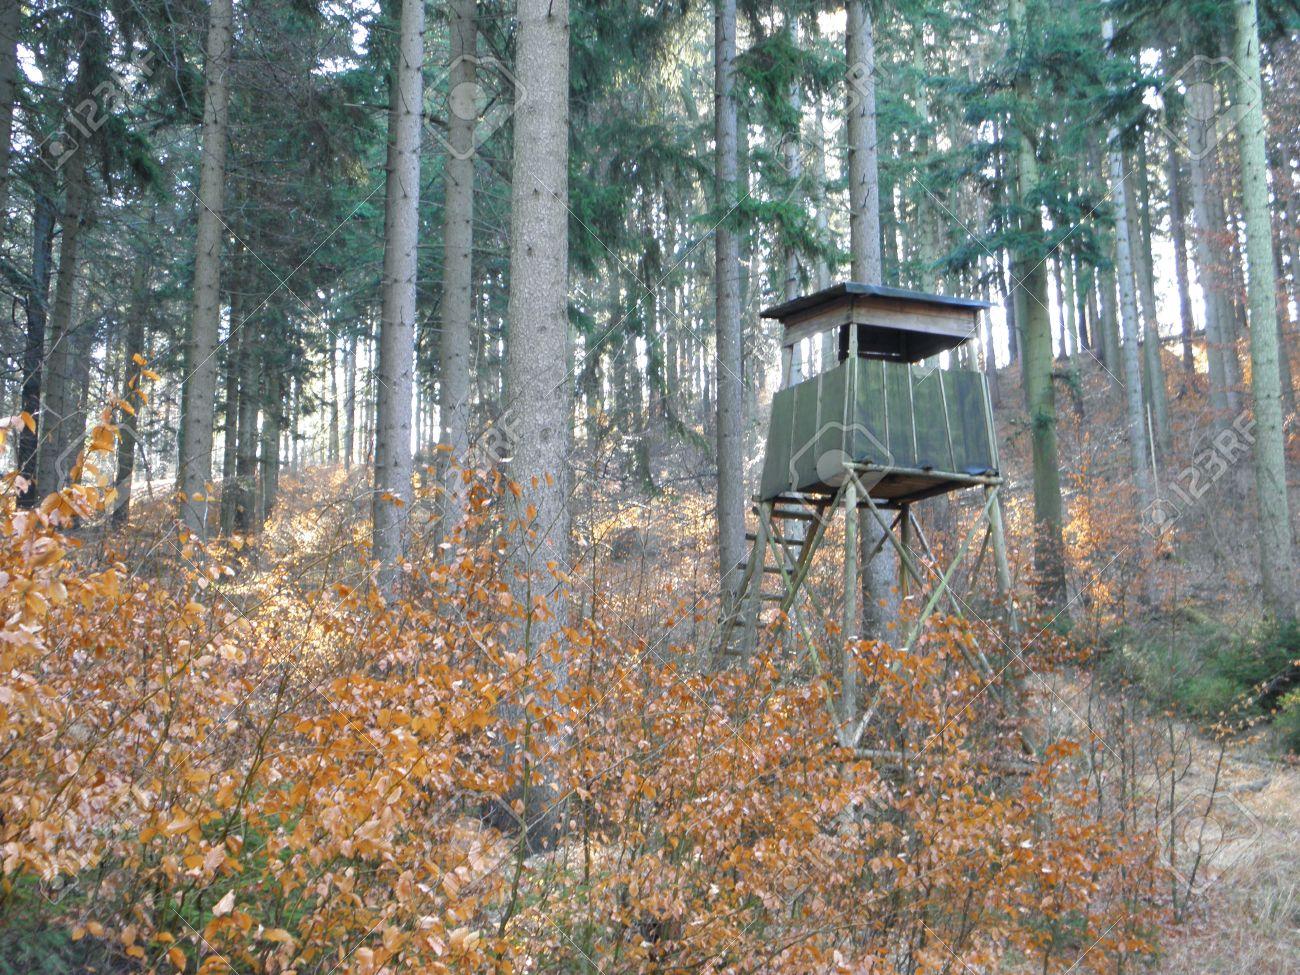 Čeke i osmatračnice 12750141-hunting-tower-in-the-forest-in-the-spring